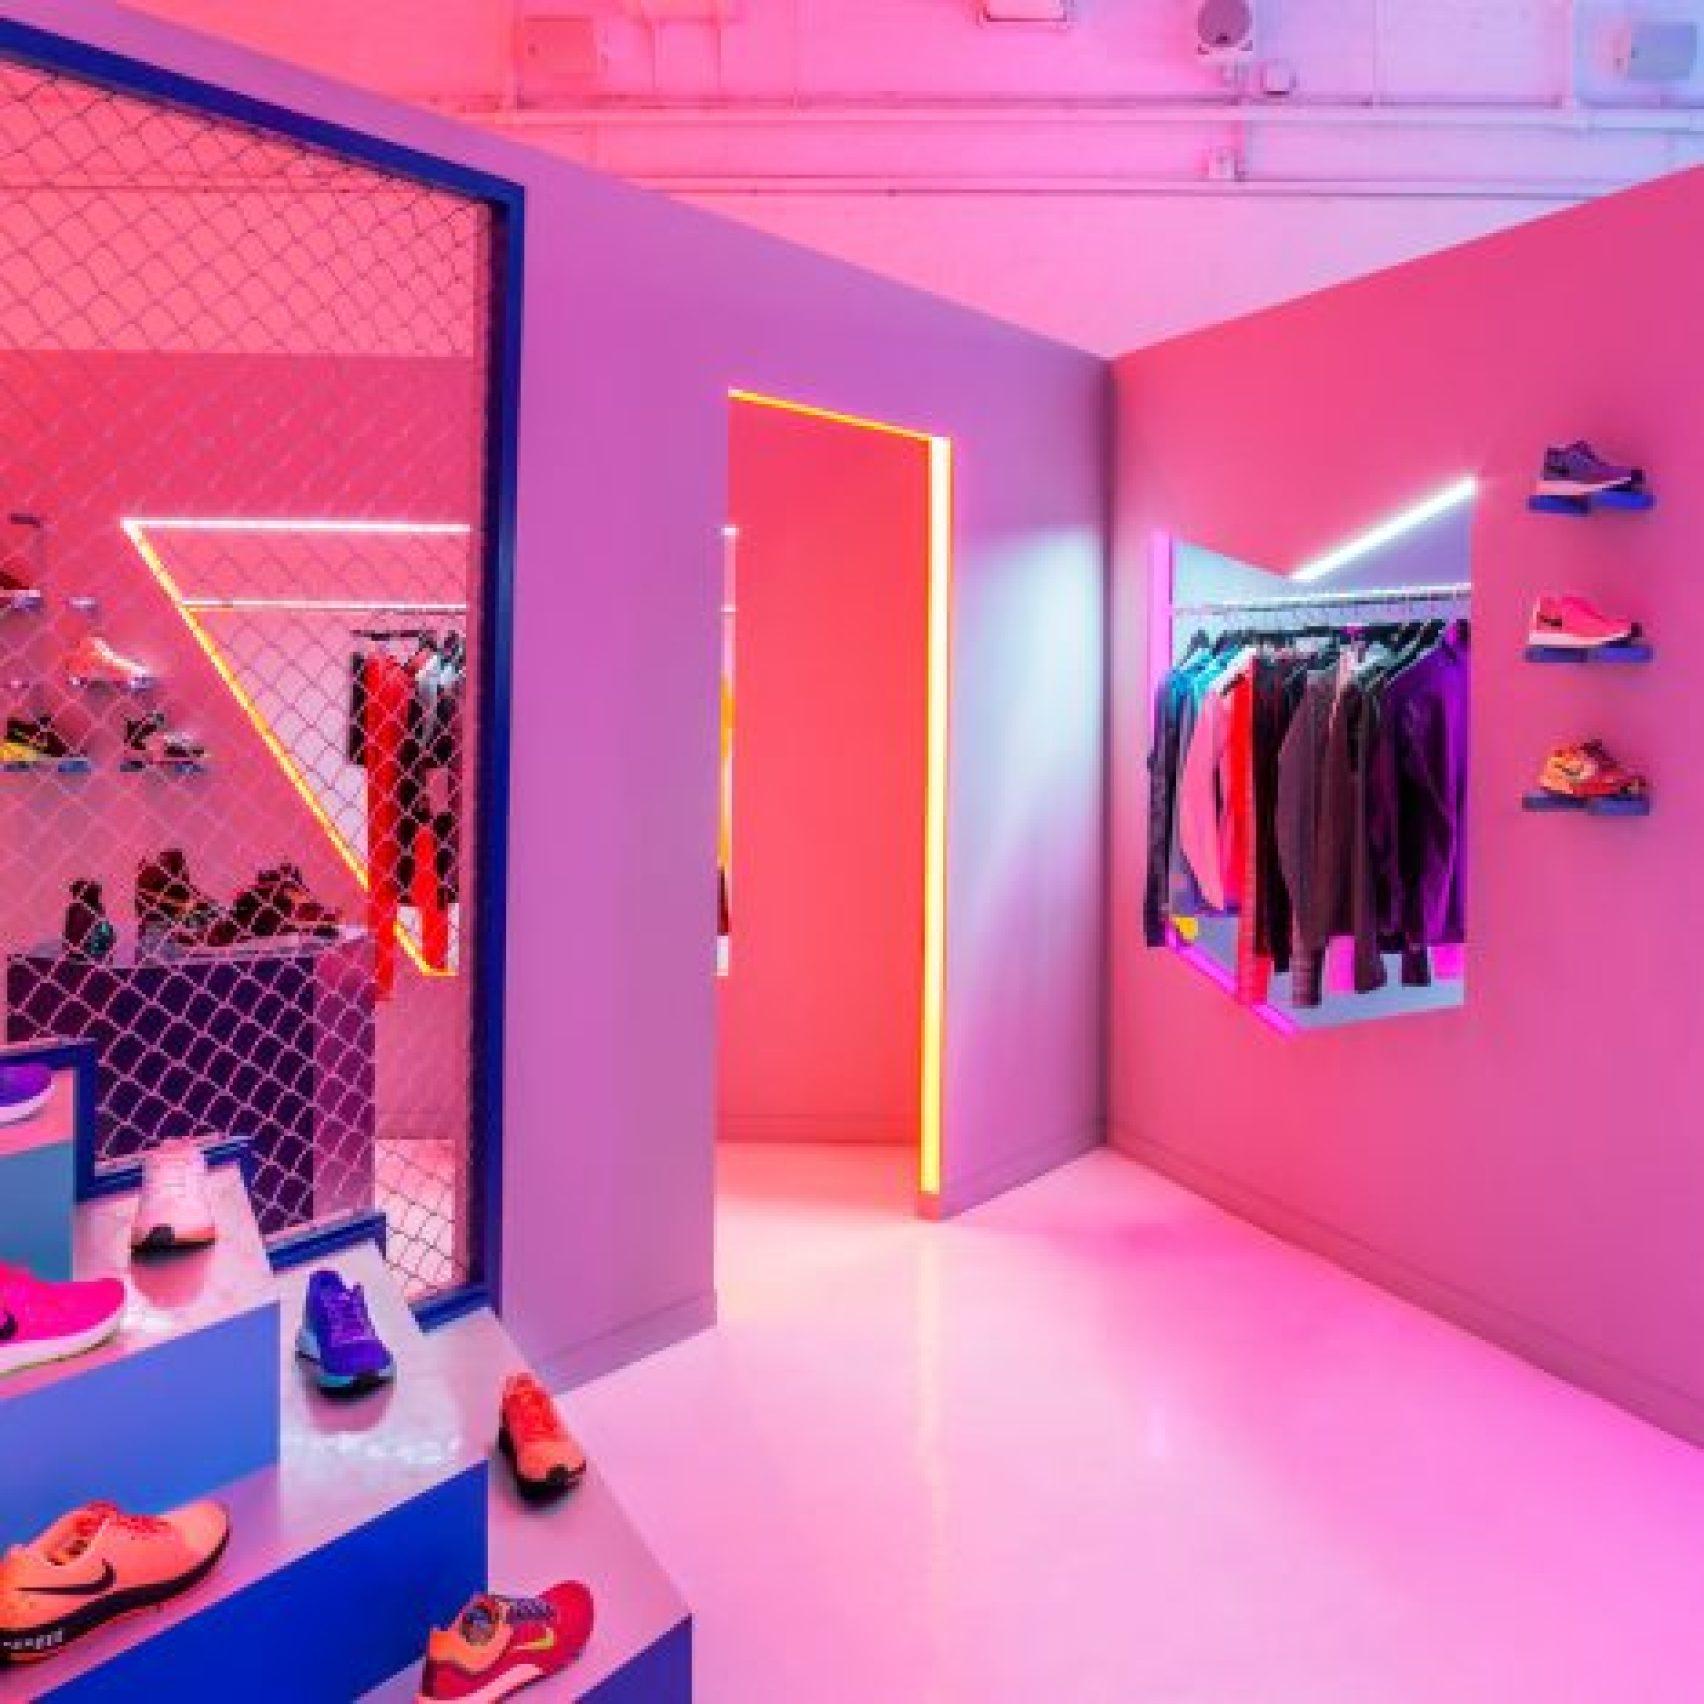 robert-storey-studio-nike-presentation-space-col